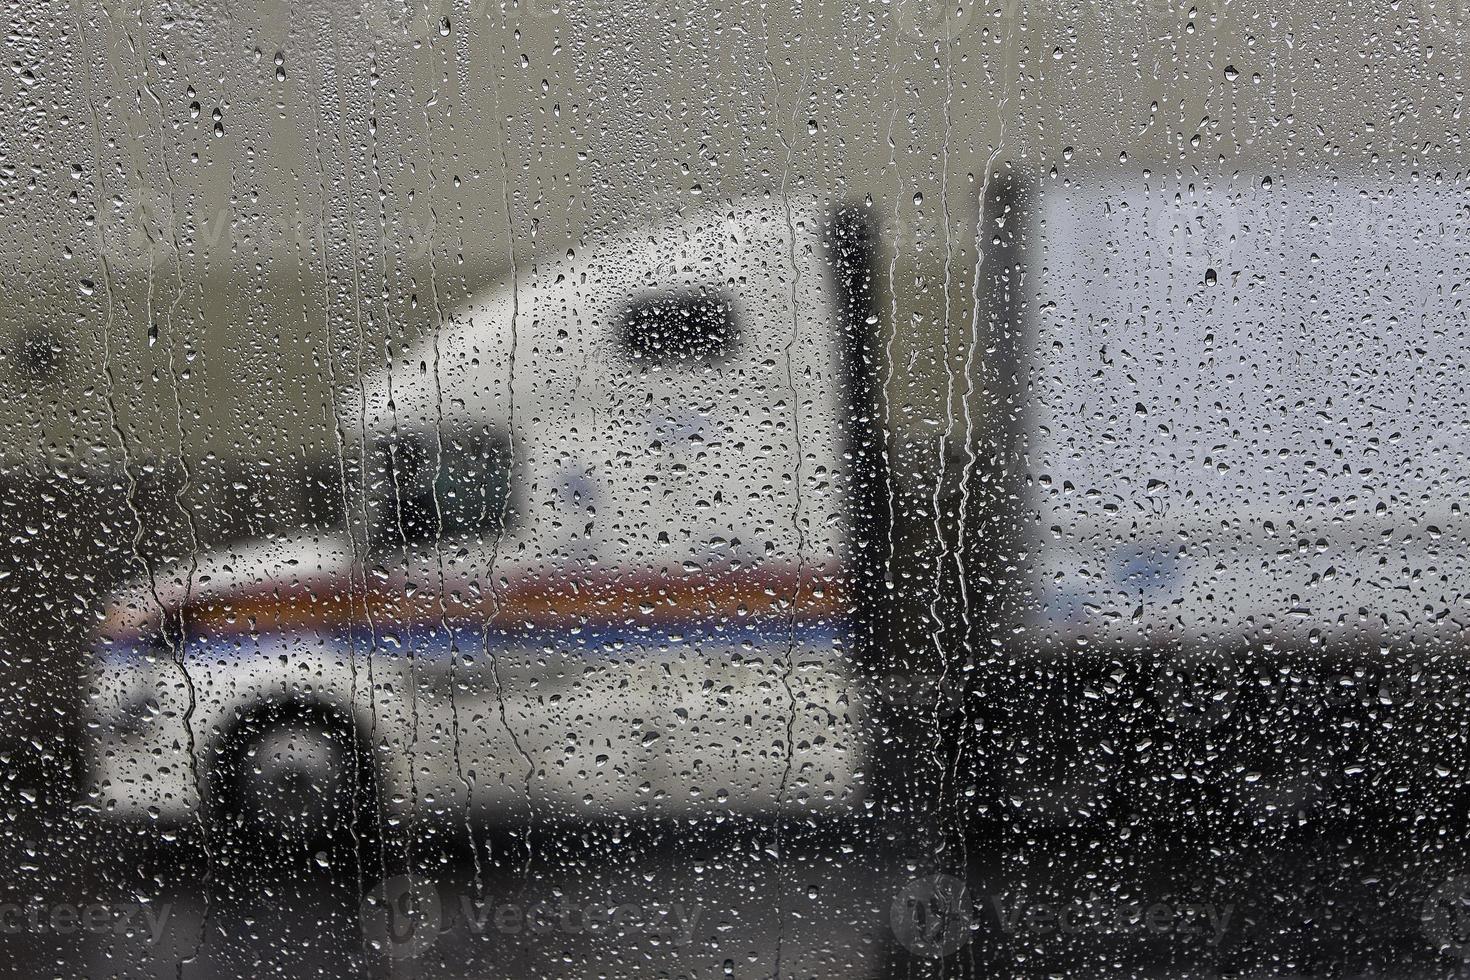 semi truck in the rainy windshield photo